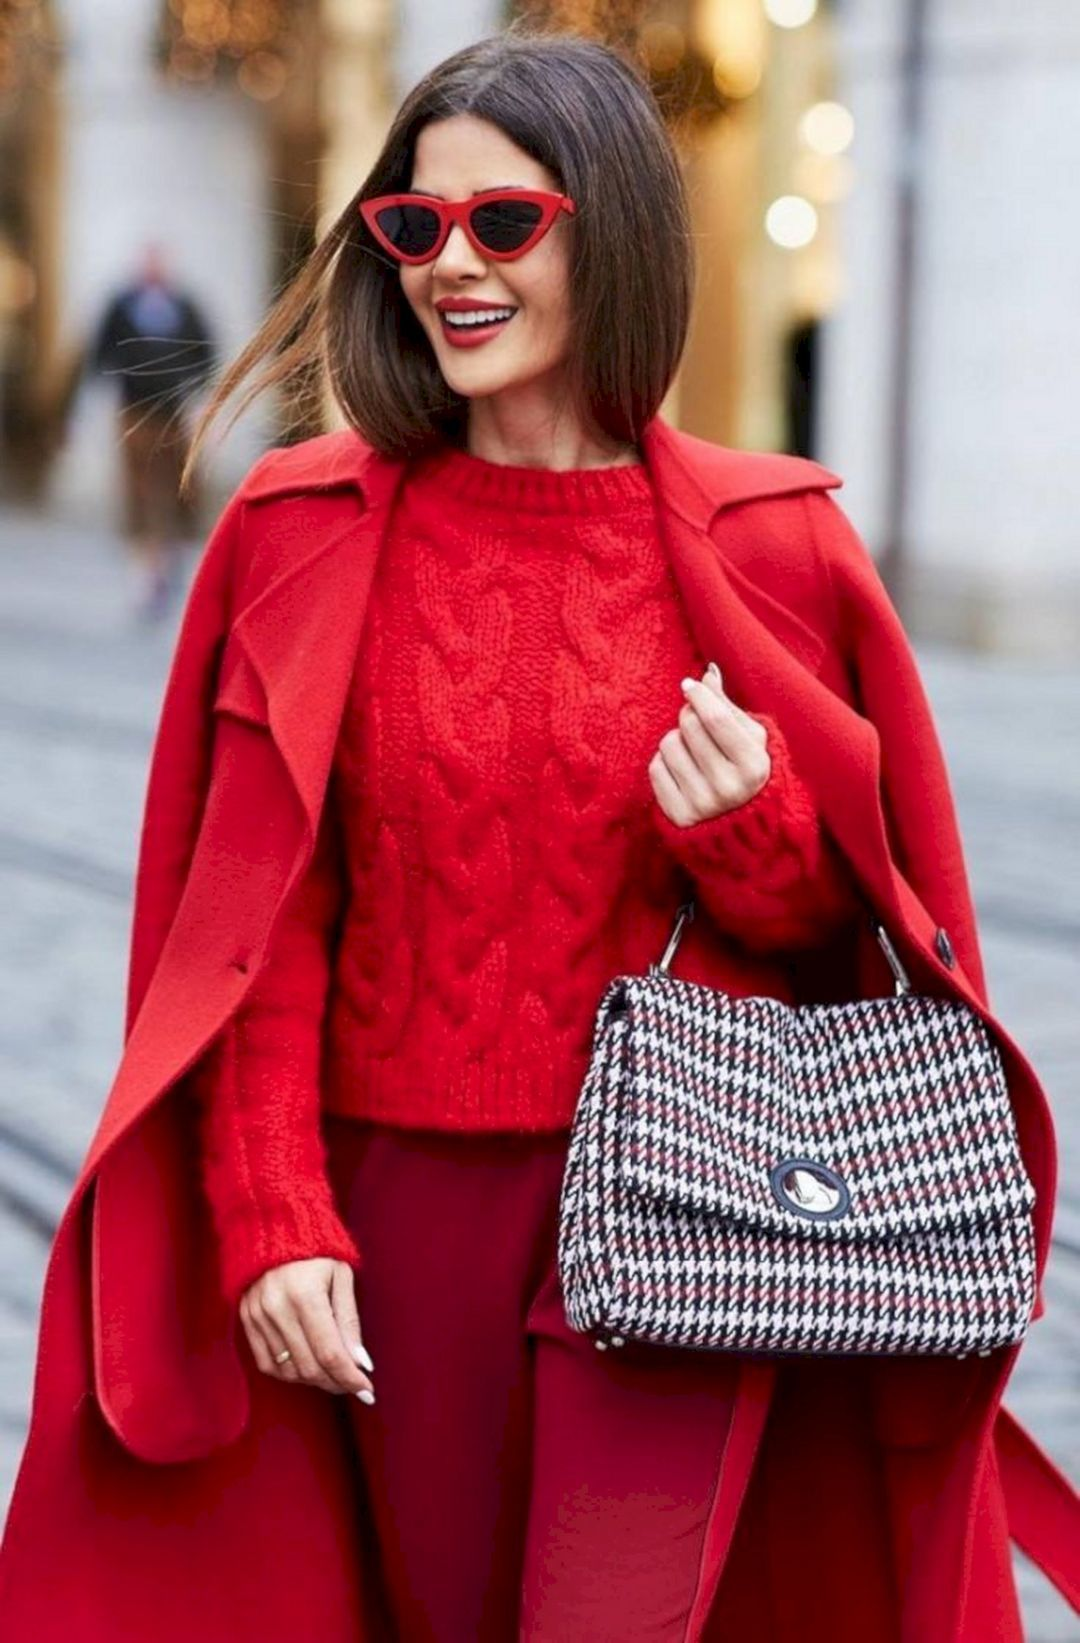 Winter Ruby Red fashion